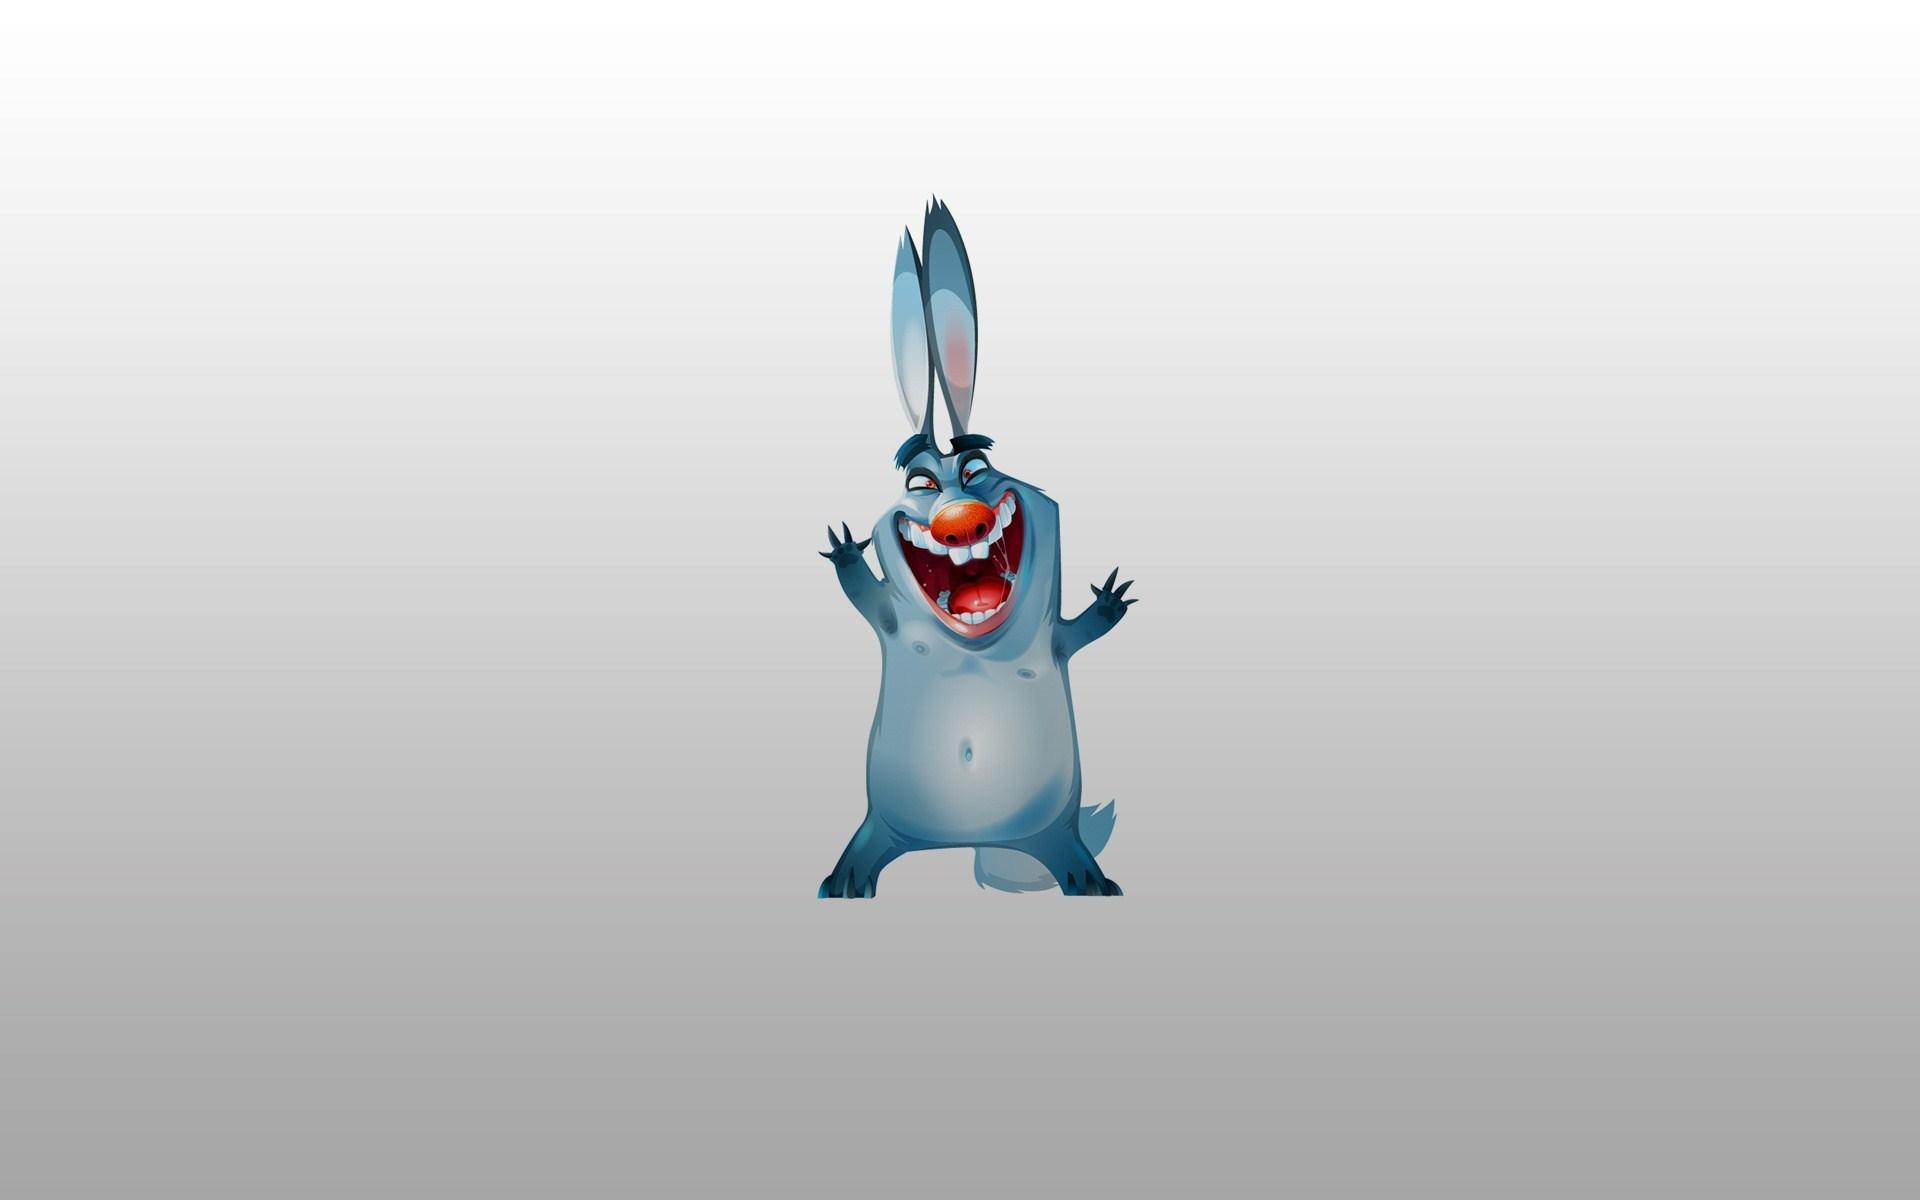 Rabbit Happy Minimalism Funny